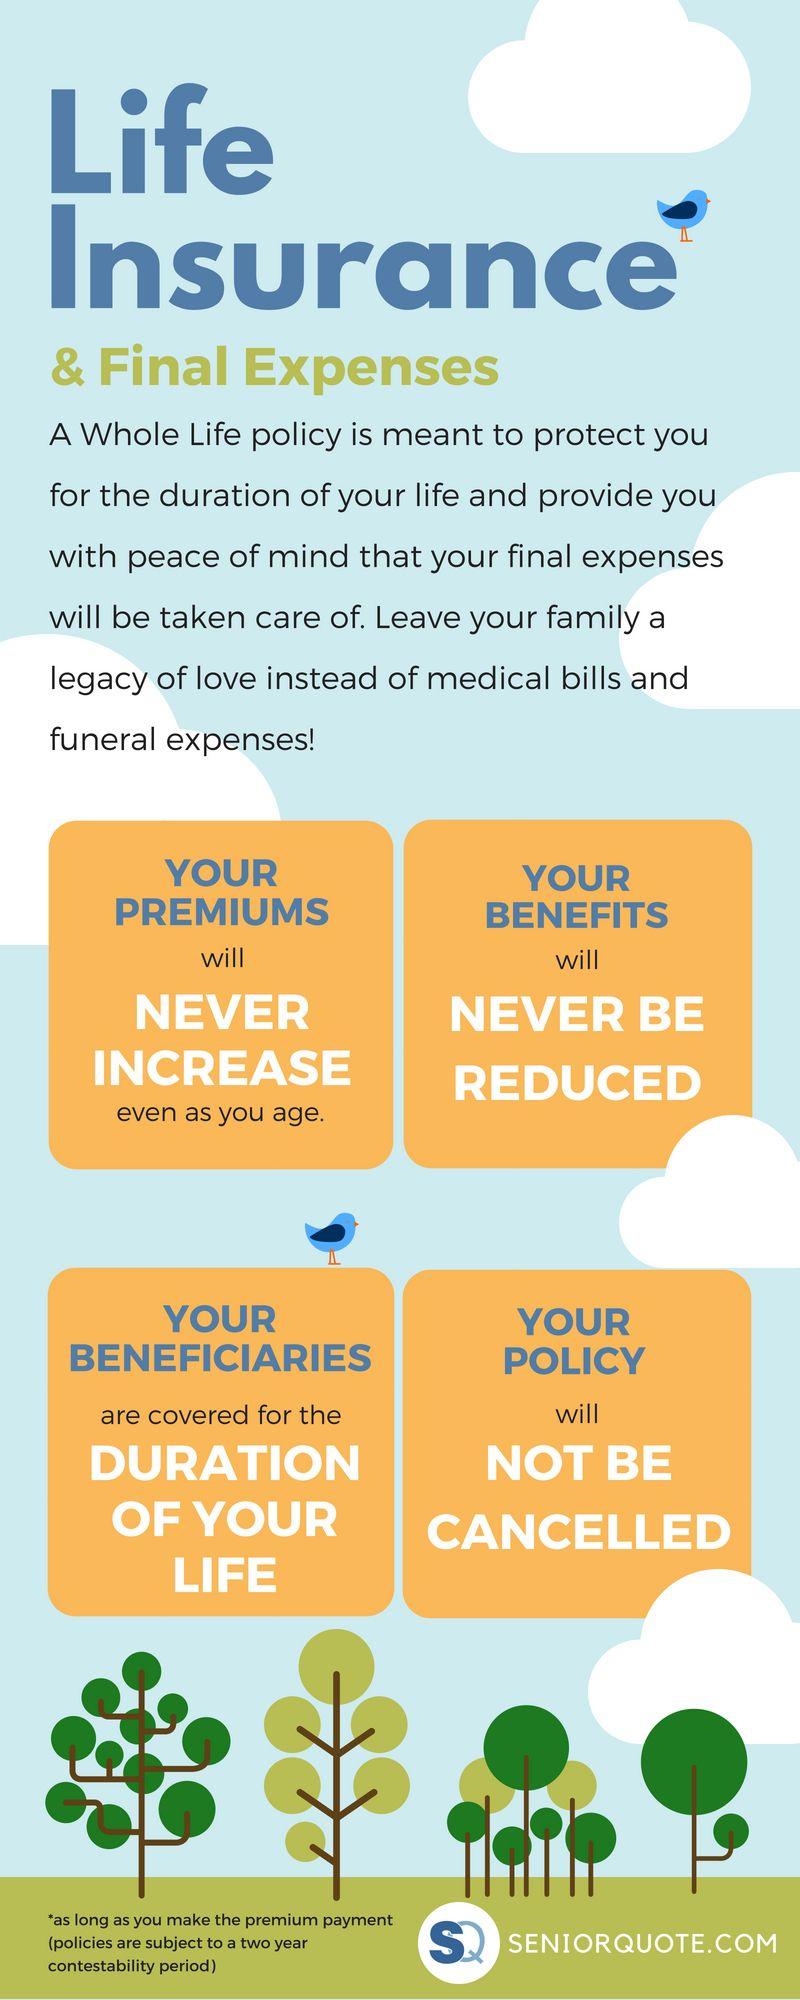 Whole Life Insurance for Seniors Life insurance for